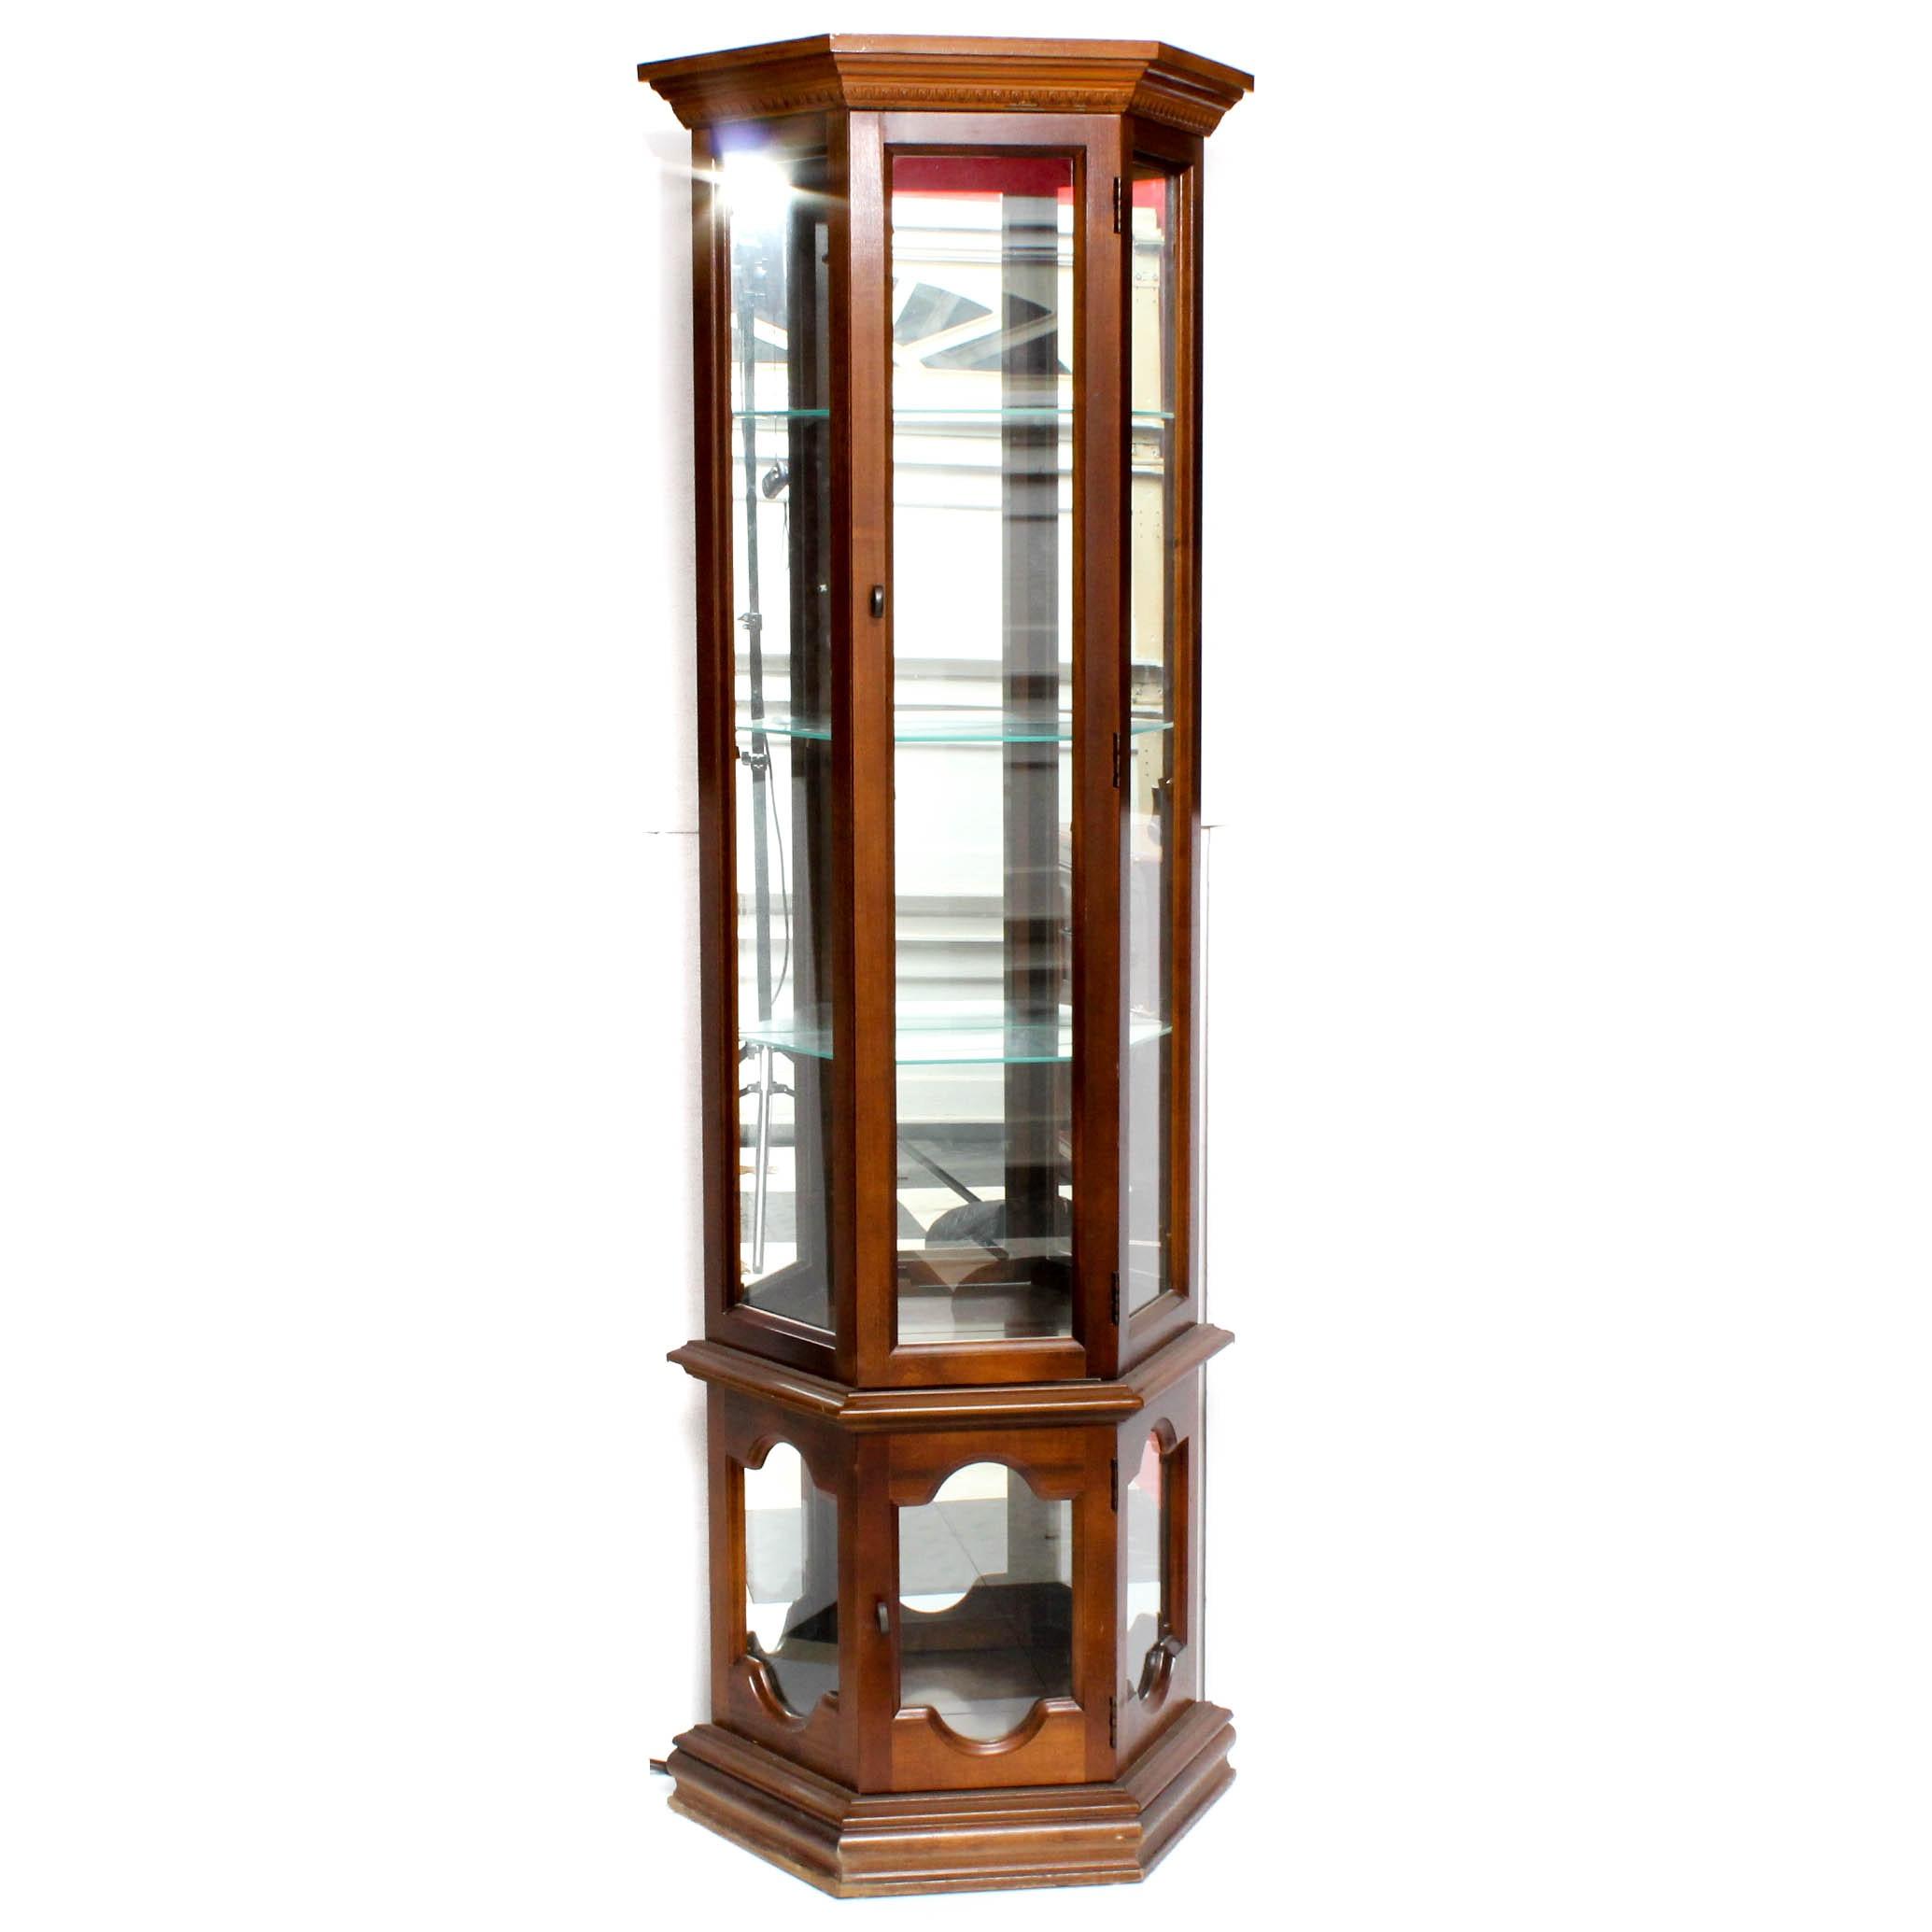 Pulaski Illuminated Hardwood Display Cabinet, Late 20th Century